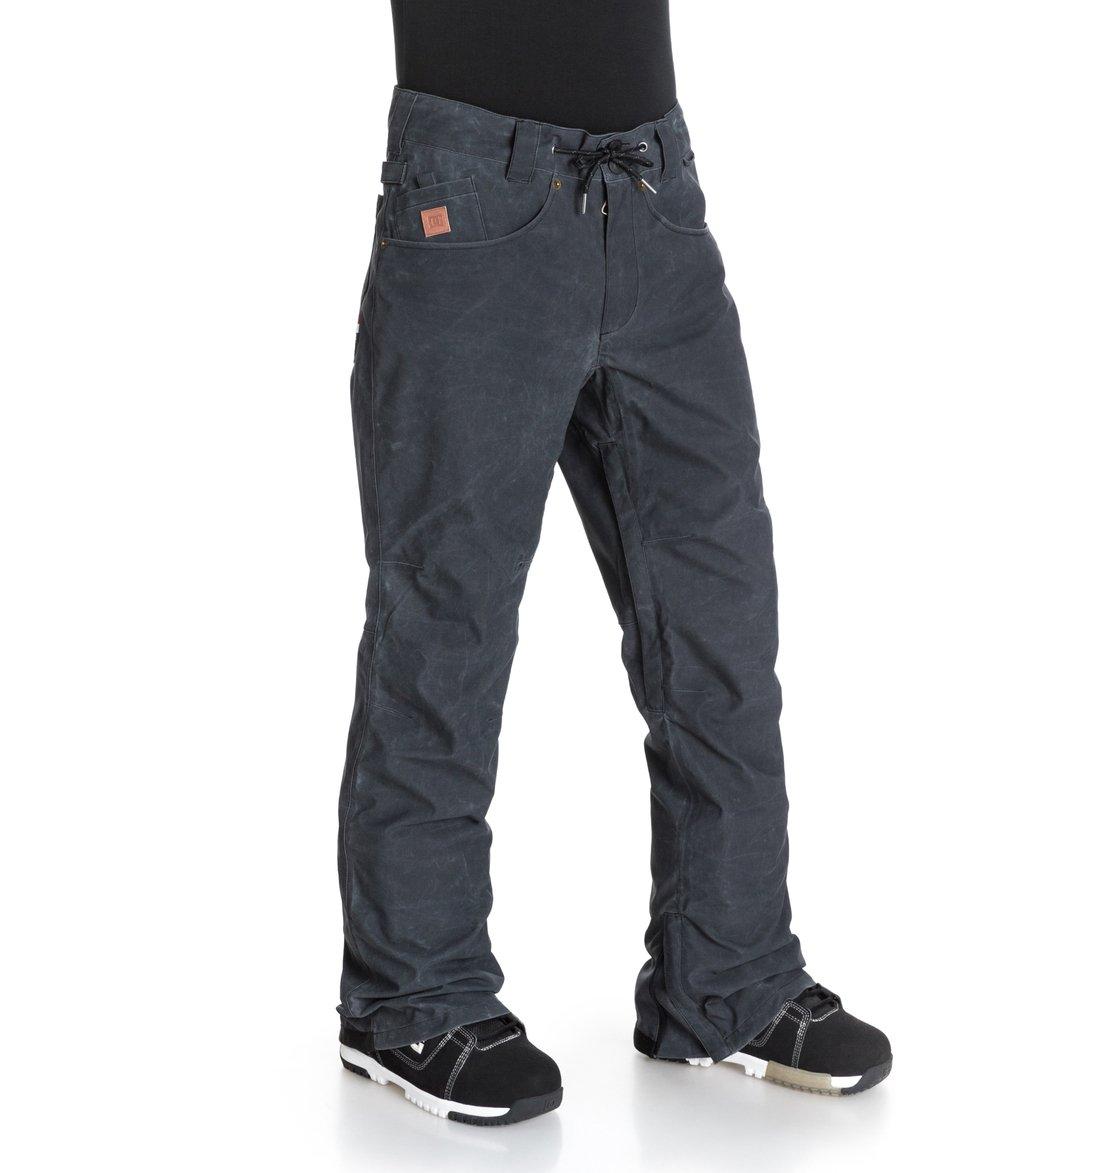 EDYTP03003 de Shoes Pantalon snowboard Relay DC 2 FzSxpp